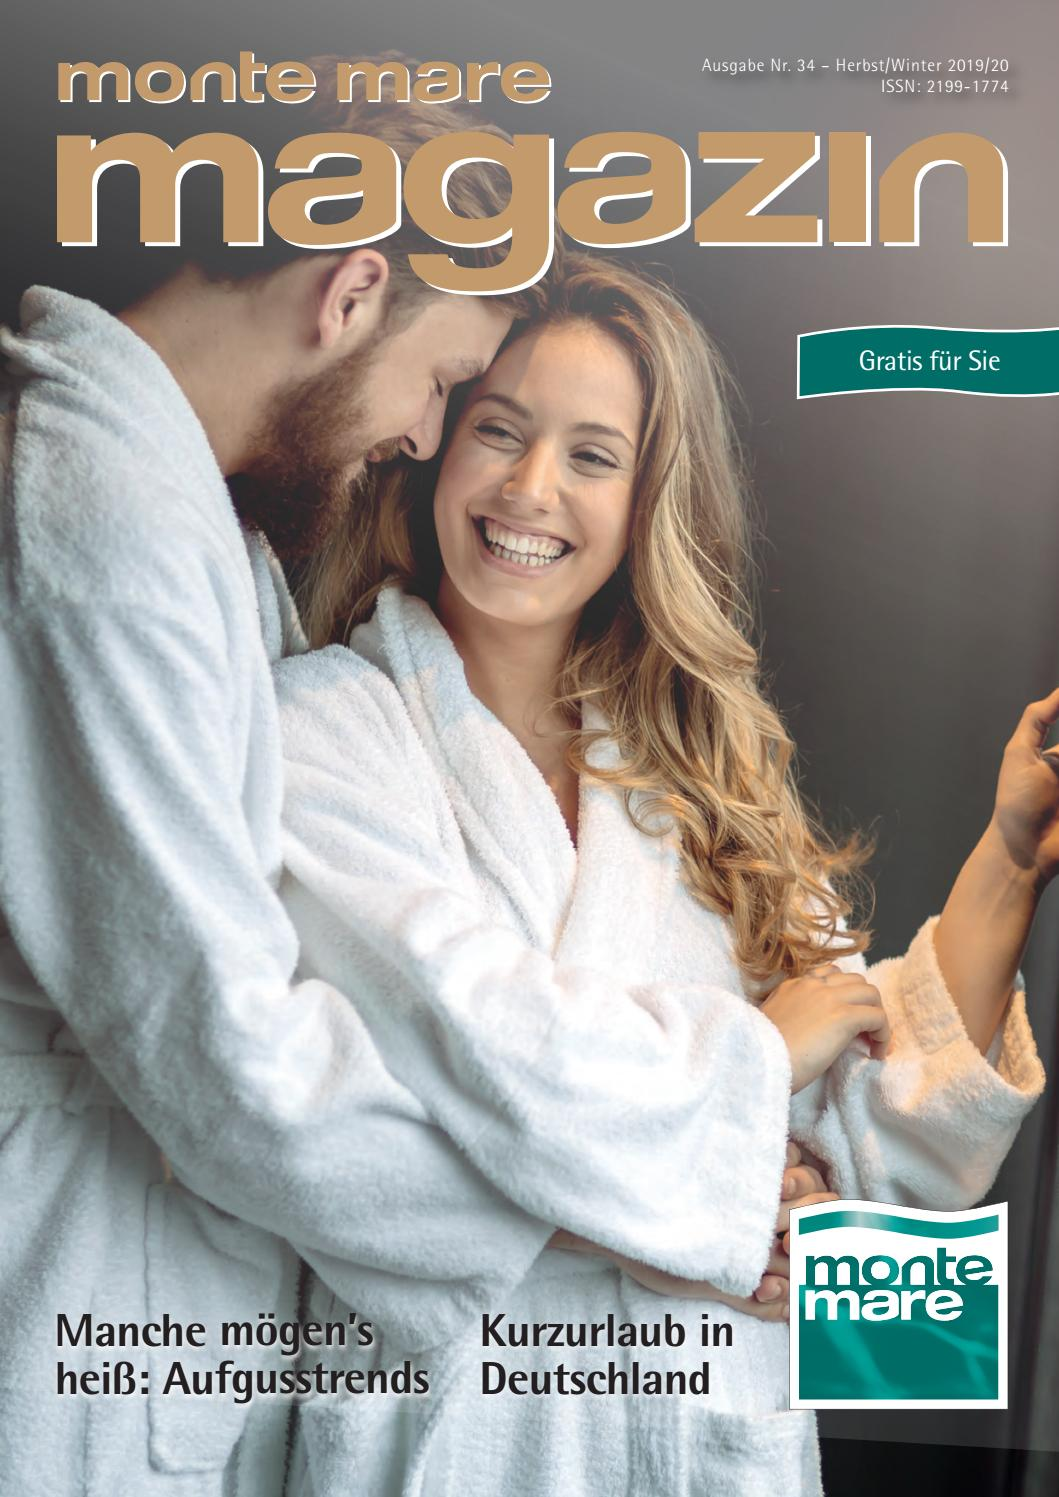 monte mare Magazin Winter 2019/2020 - monte mare Kreuzau